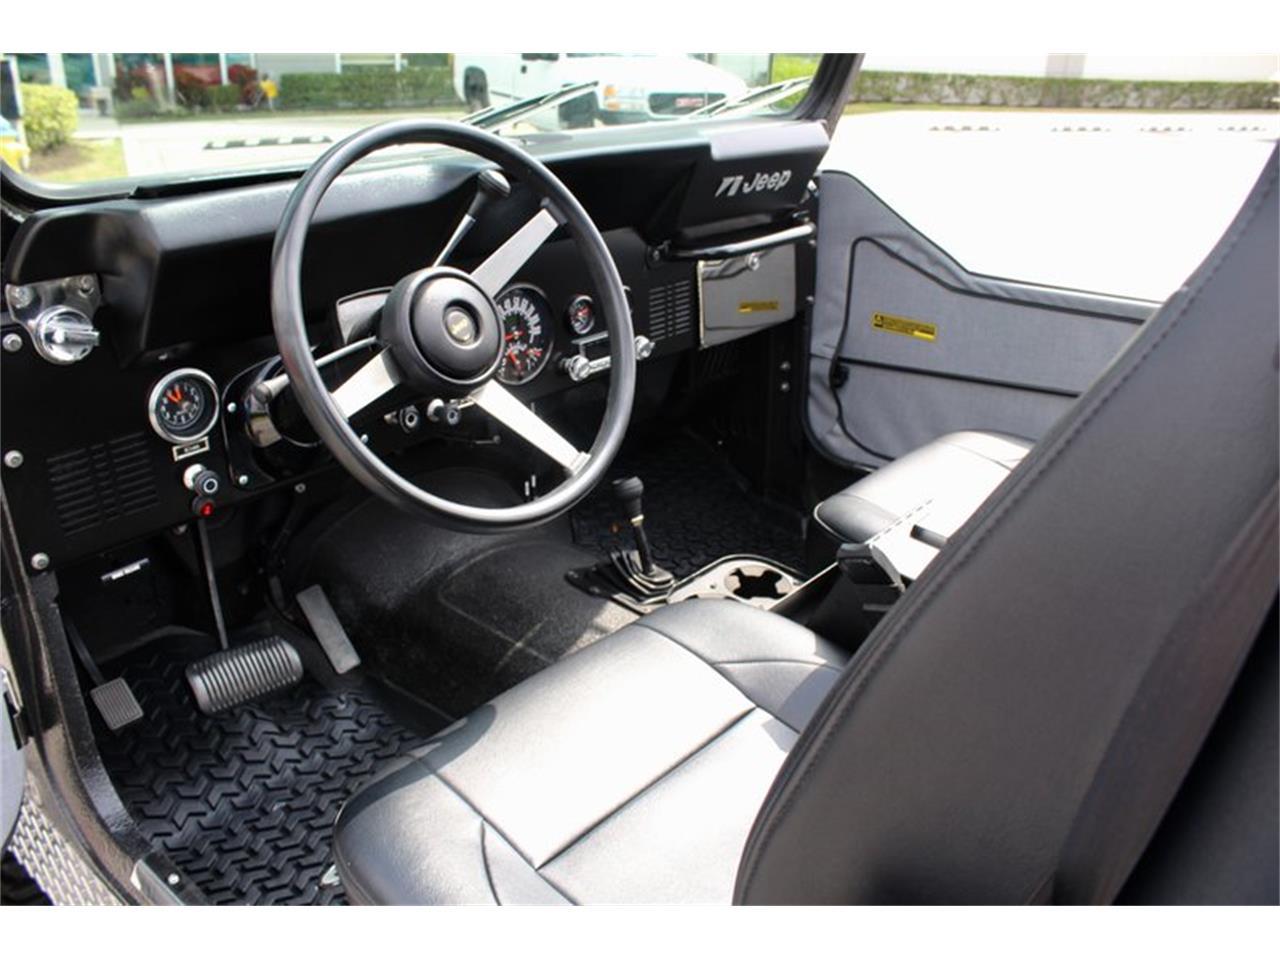 1981 Jeep CJ7 for sale in Sarasota, FL / ClassicCarsBay com